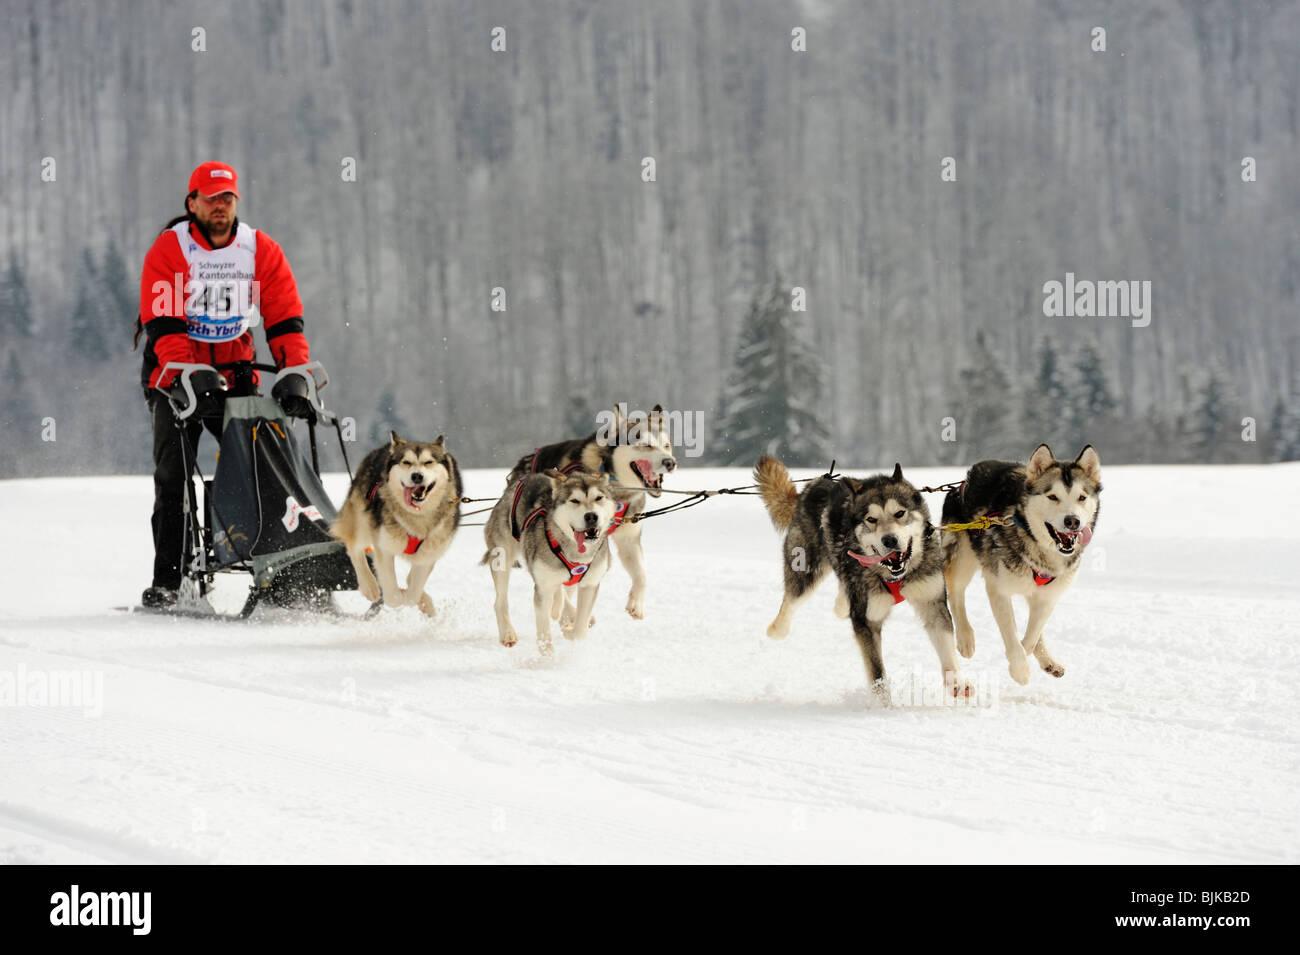 Alaskan Malamute, sled dog team with musher, Studen, Switzerland, Europe - Stock Image